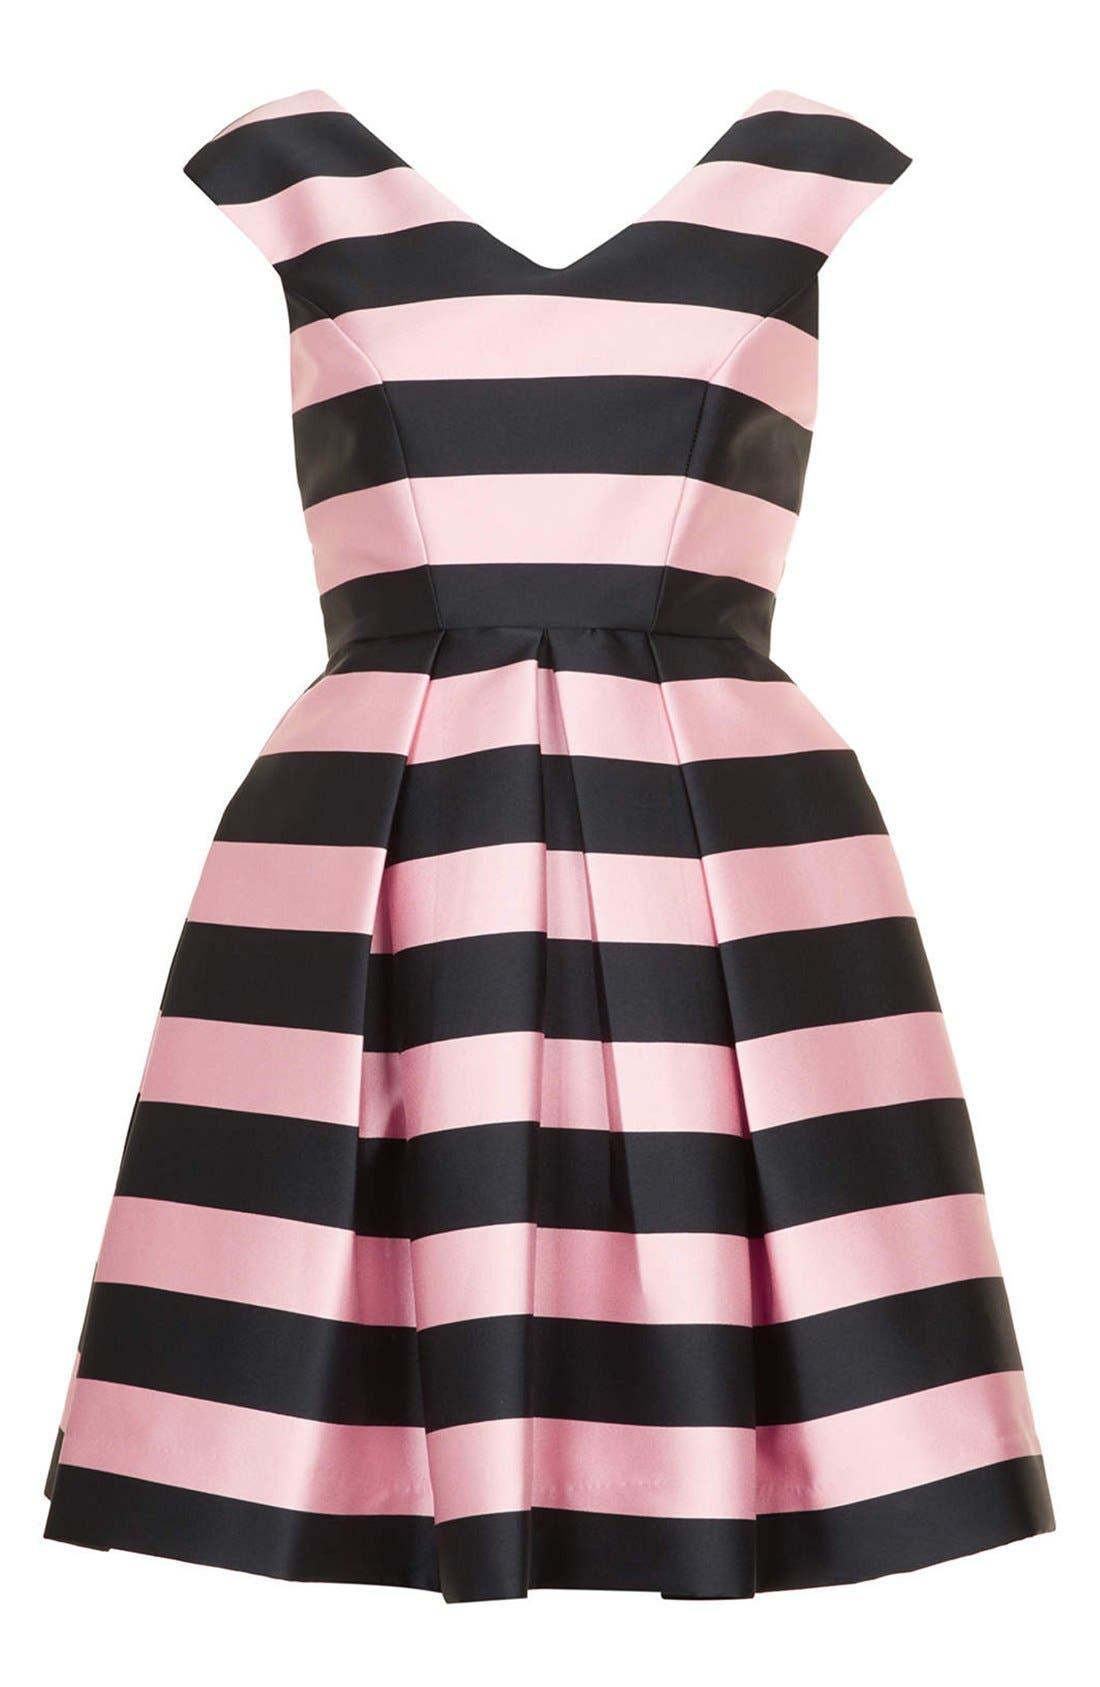 TOPSHOP, Stripe Satin Fit & Flare Dress, Alternate thumbnail 3, color, 001